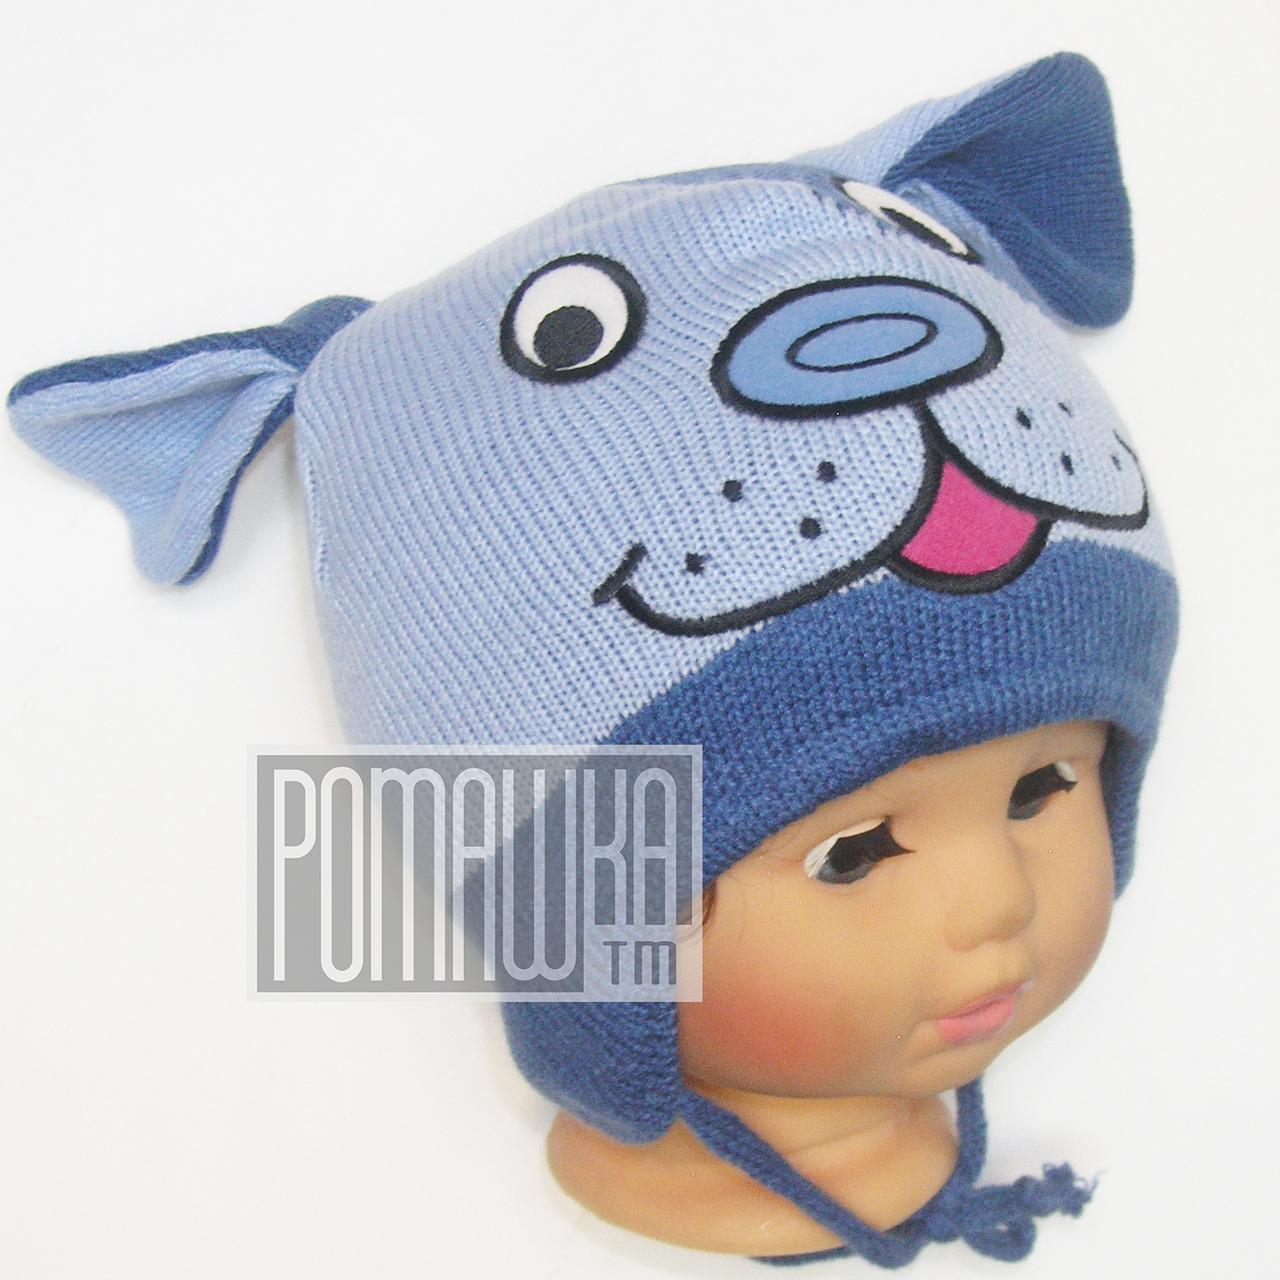 детская вязаная шапочка р 46 одинарная весенняя осенняя на завязках для мальчика